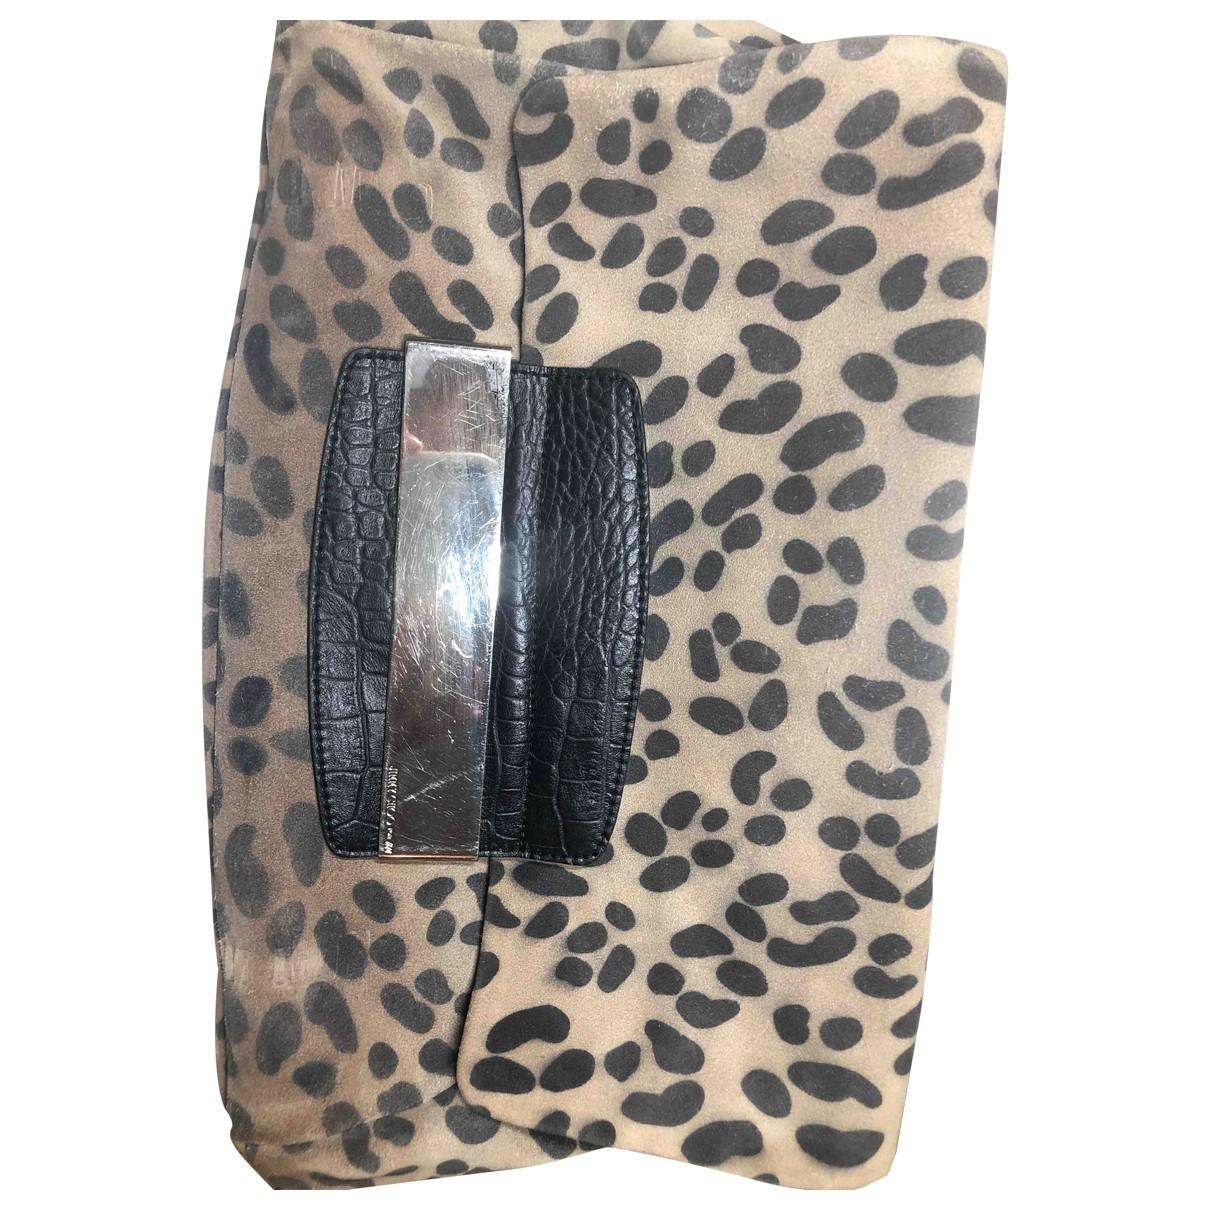 Jimmy Choo For H&m \N Camel Clutch bag for Women \N